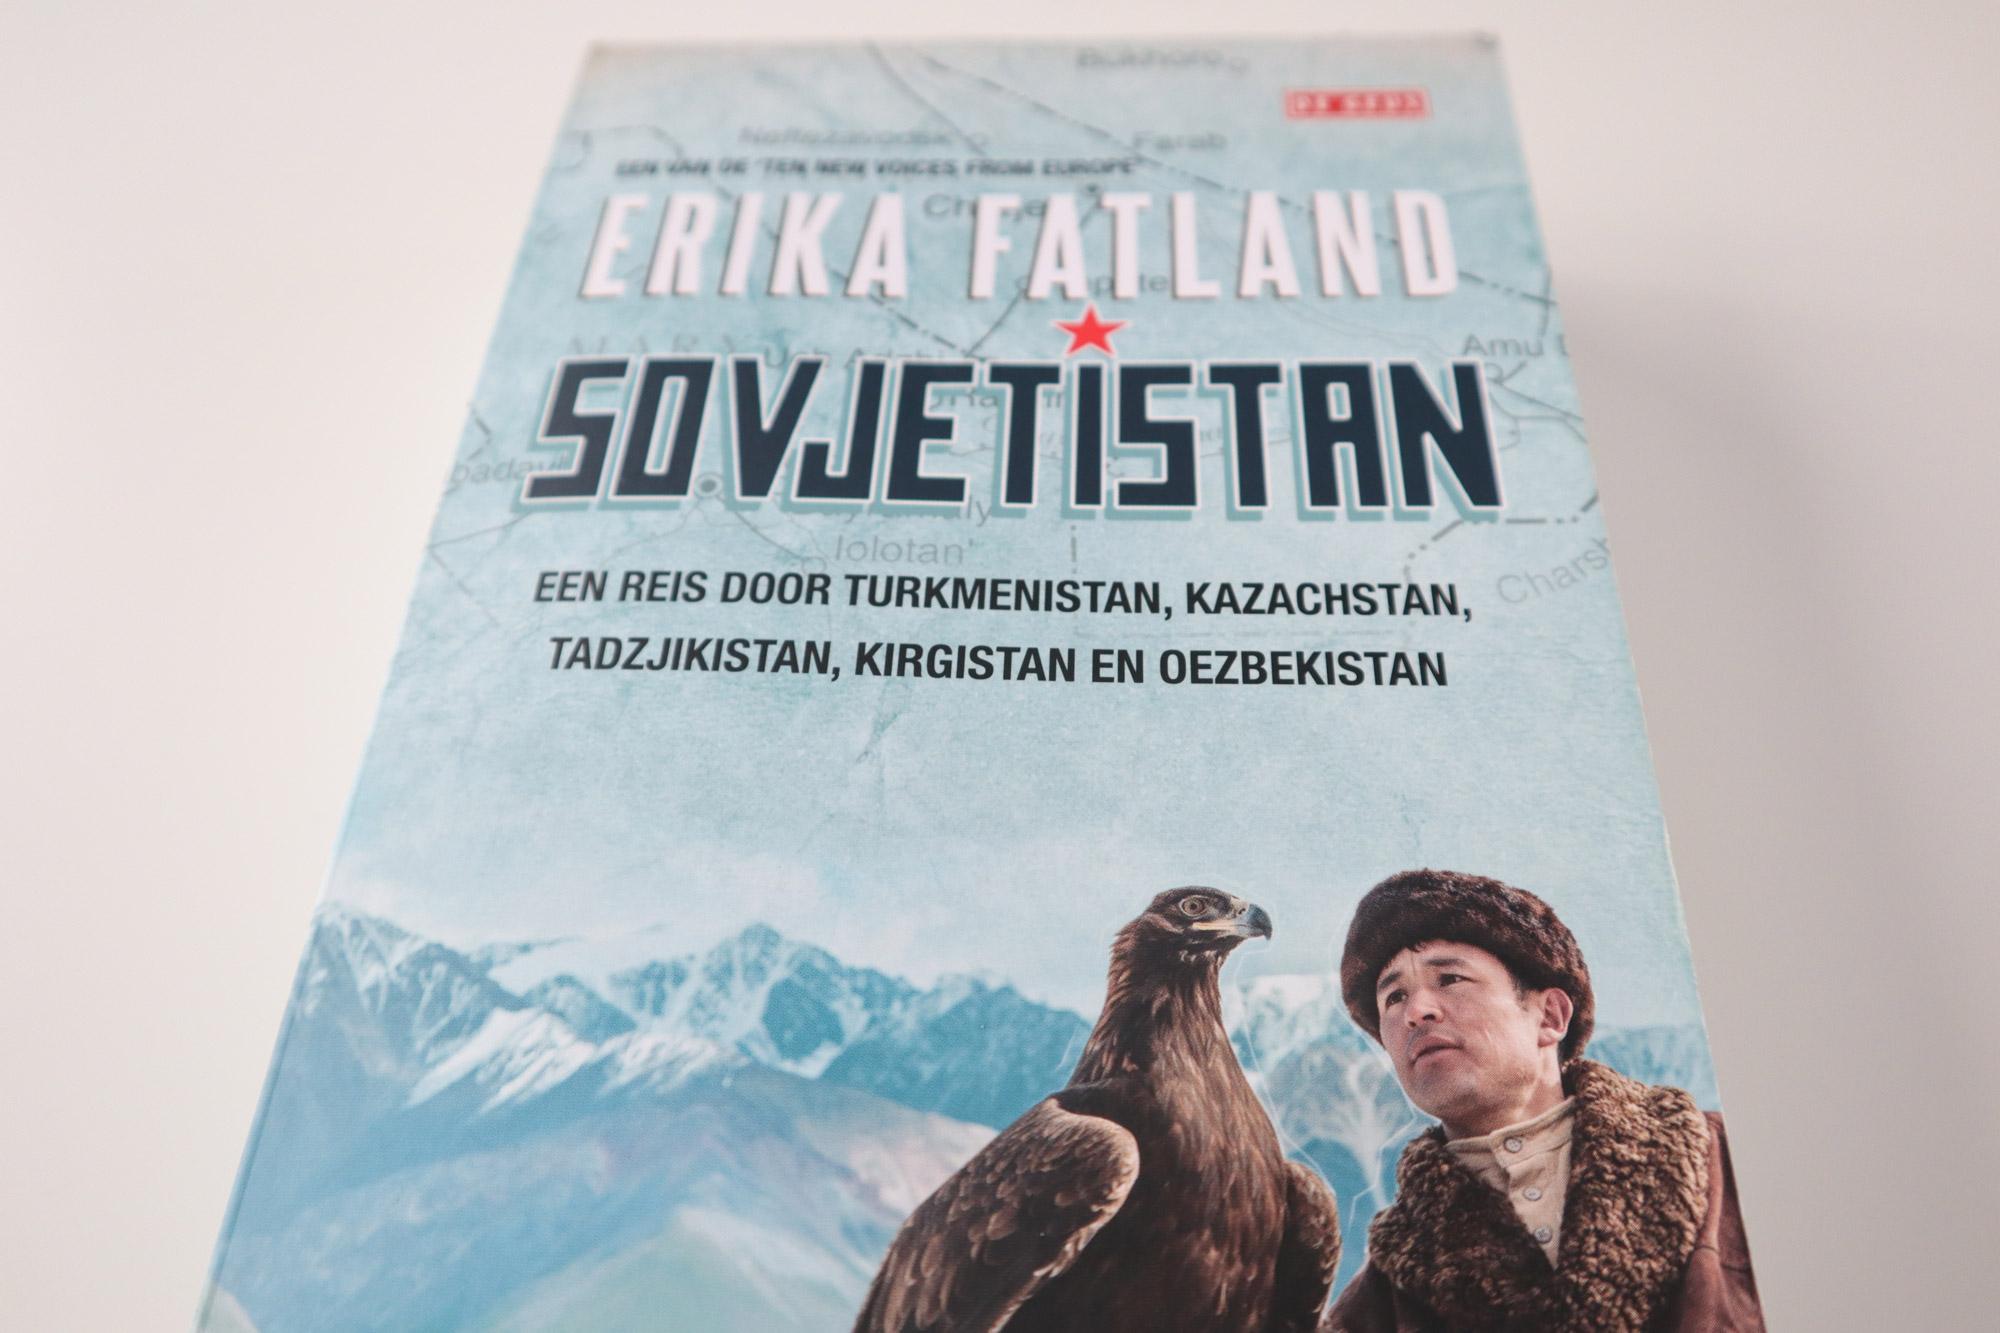 Erika Fatland- Sovjetistan